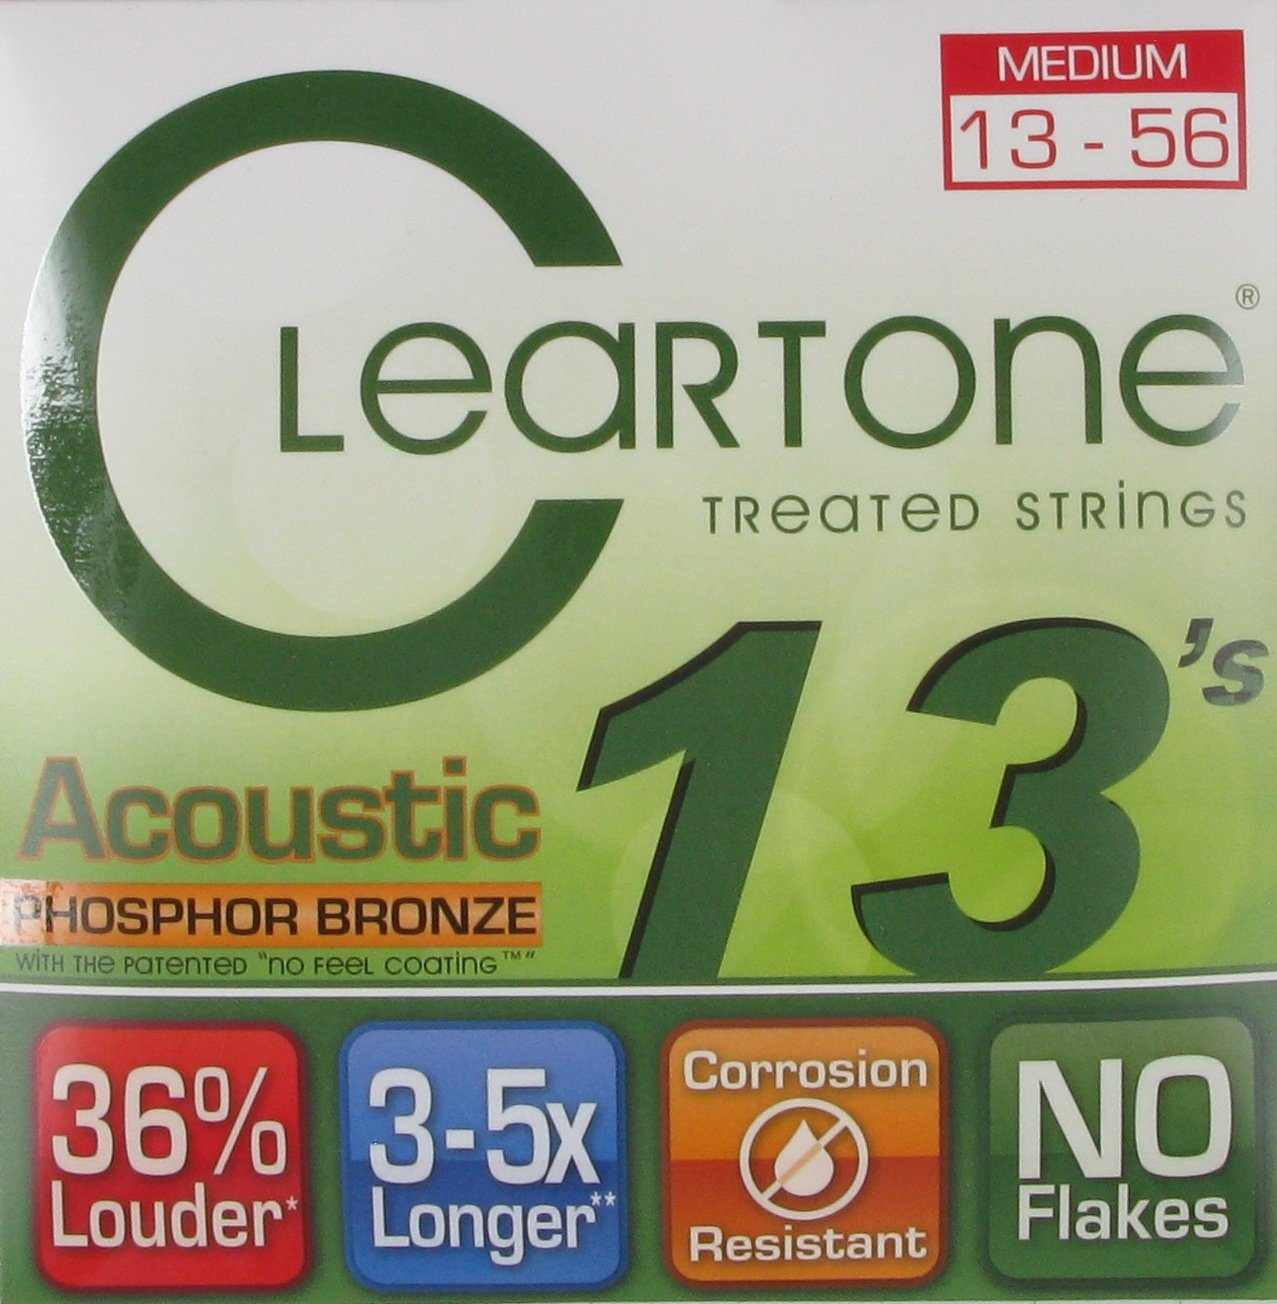 Cleartone Acoustic Treated Strings PB Medium